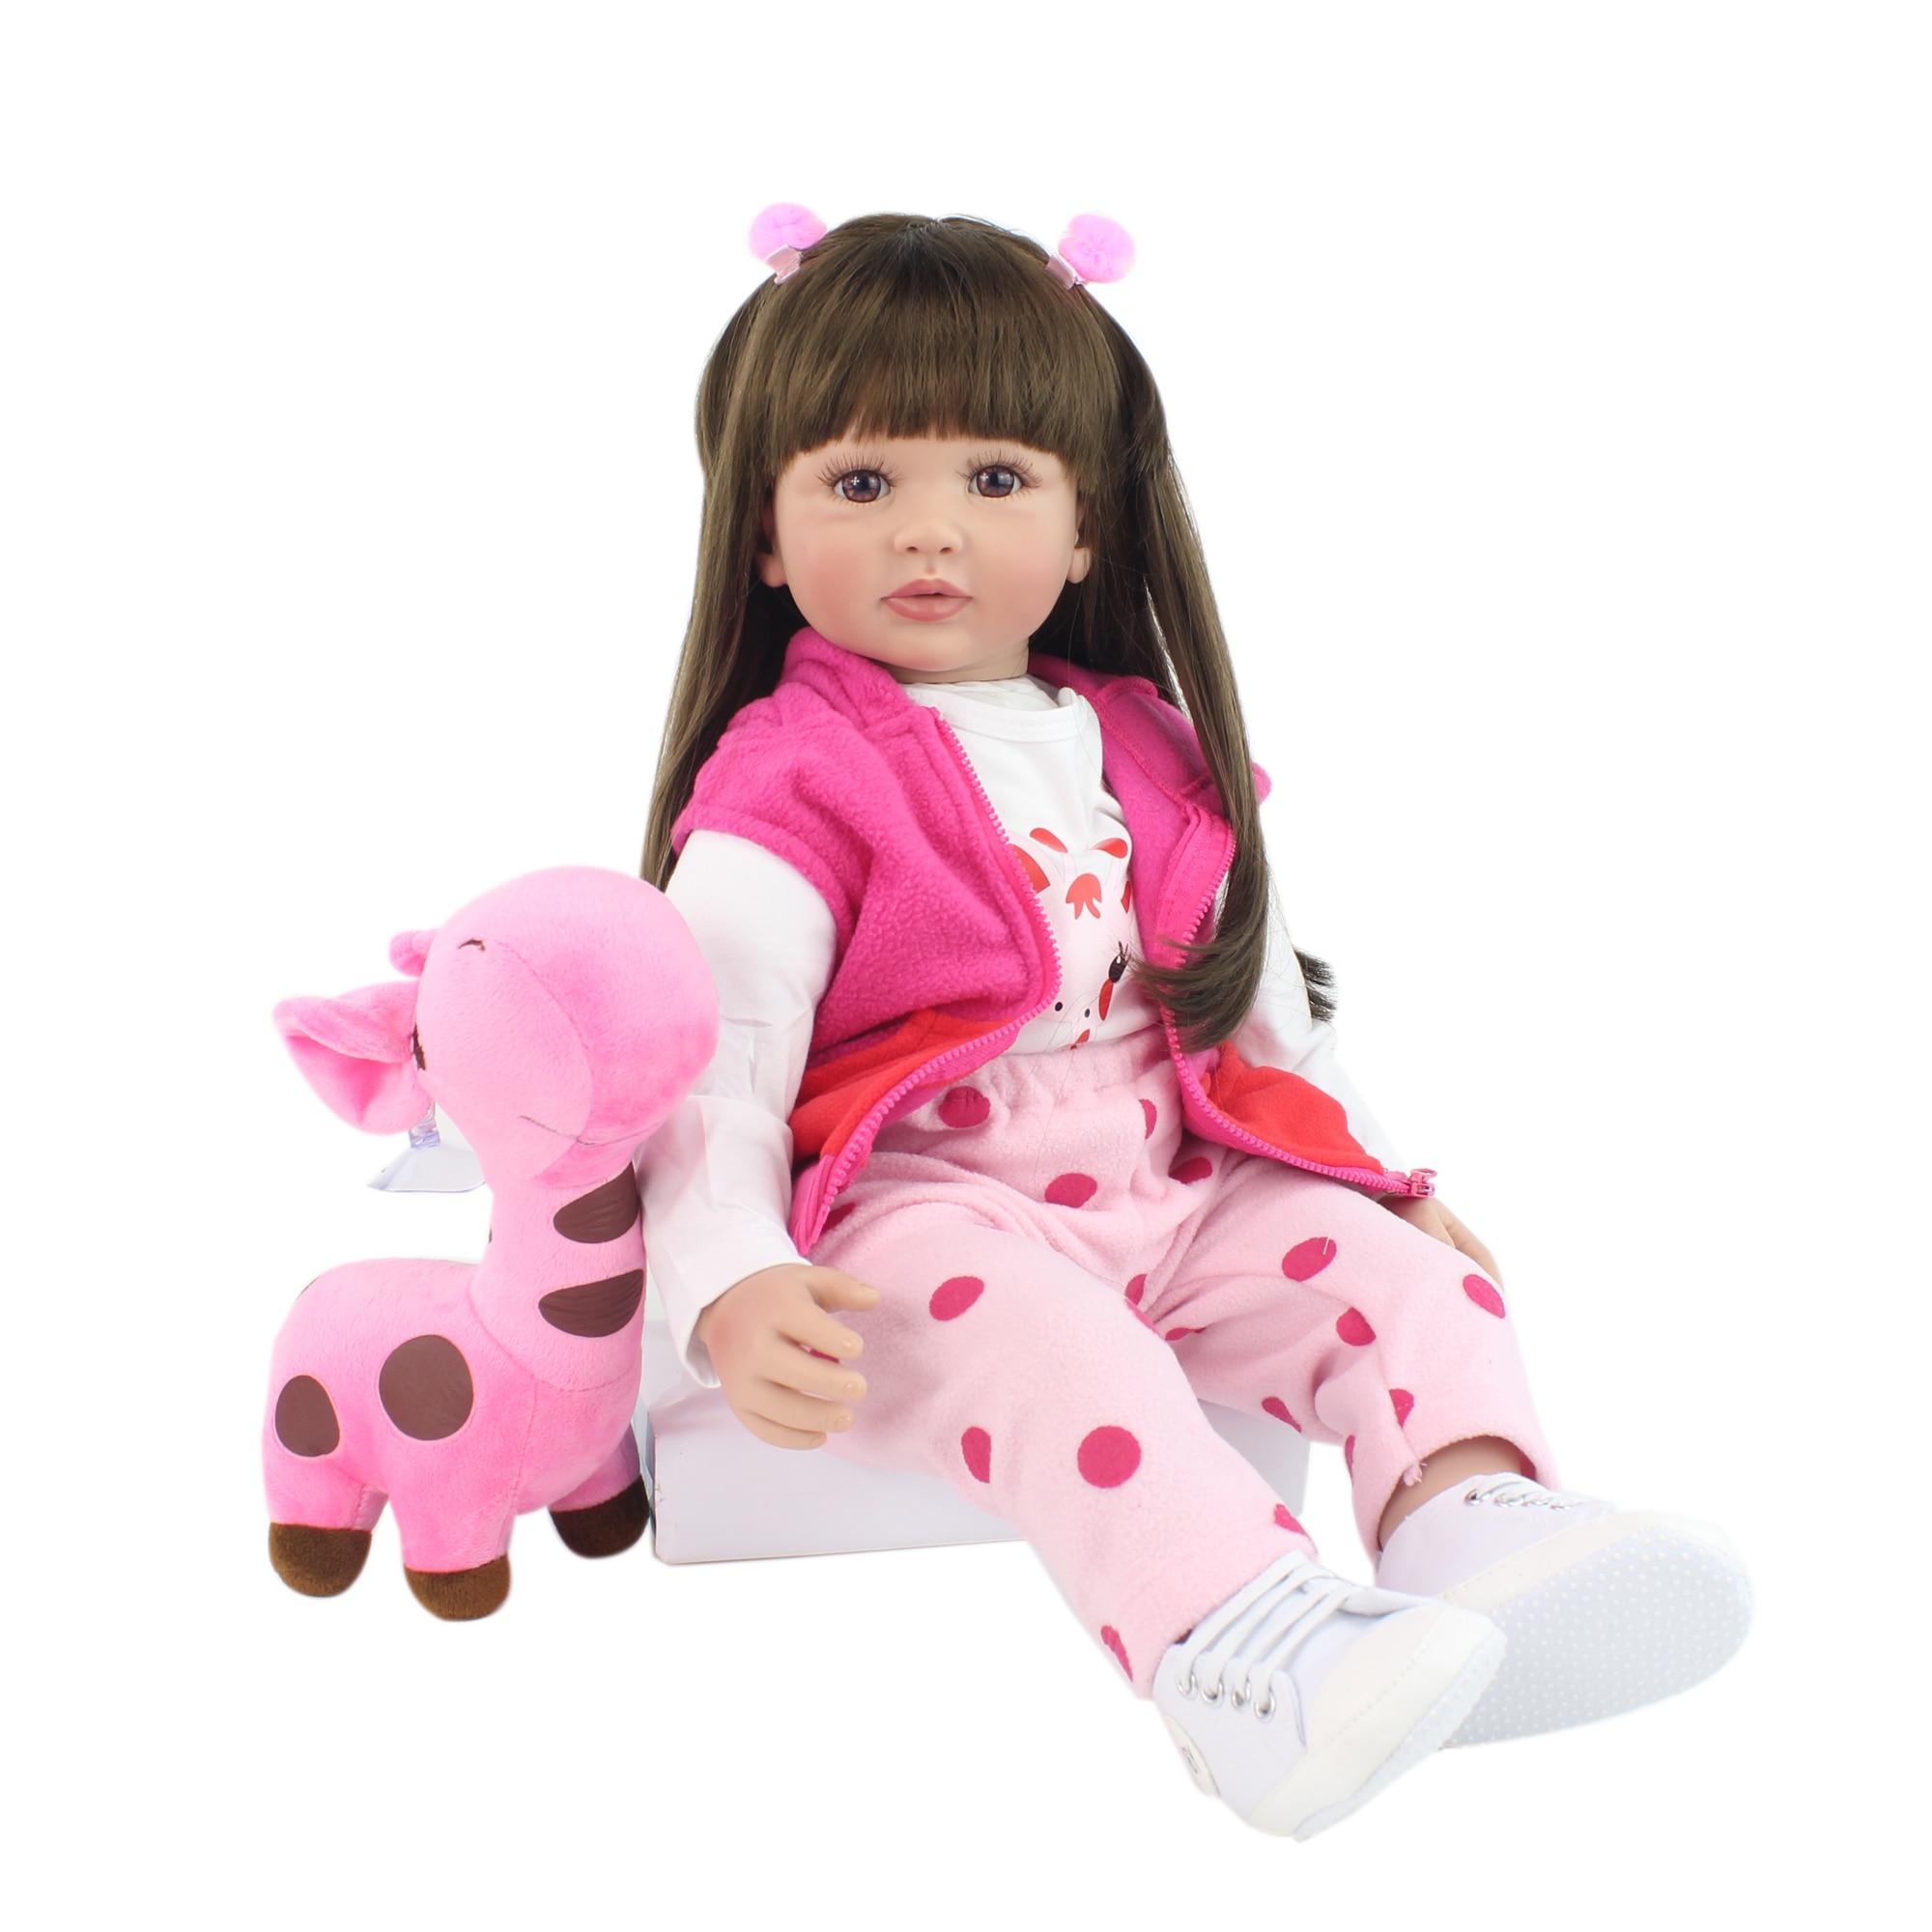 60cm Silicone Reborn Toddler Princess Toy Doll 24